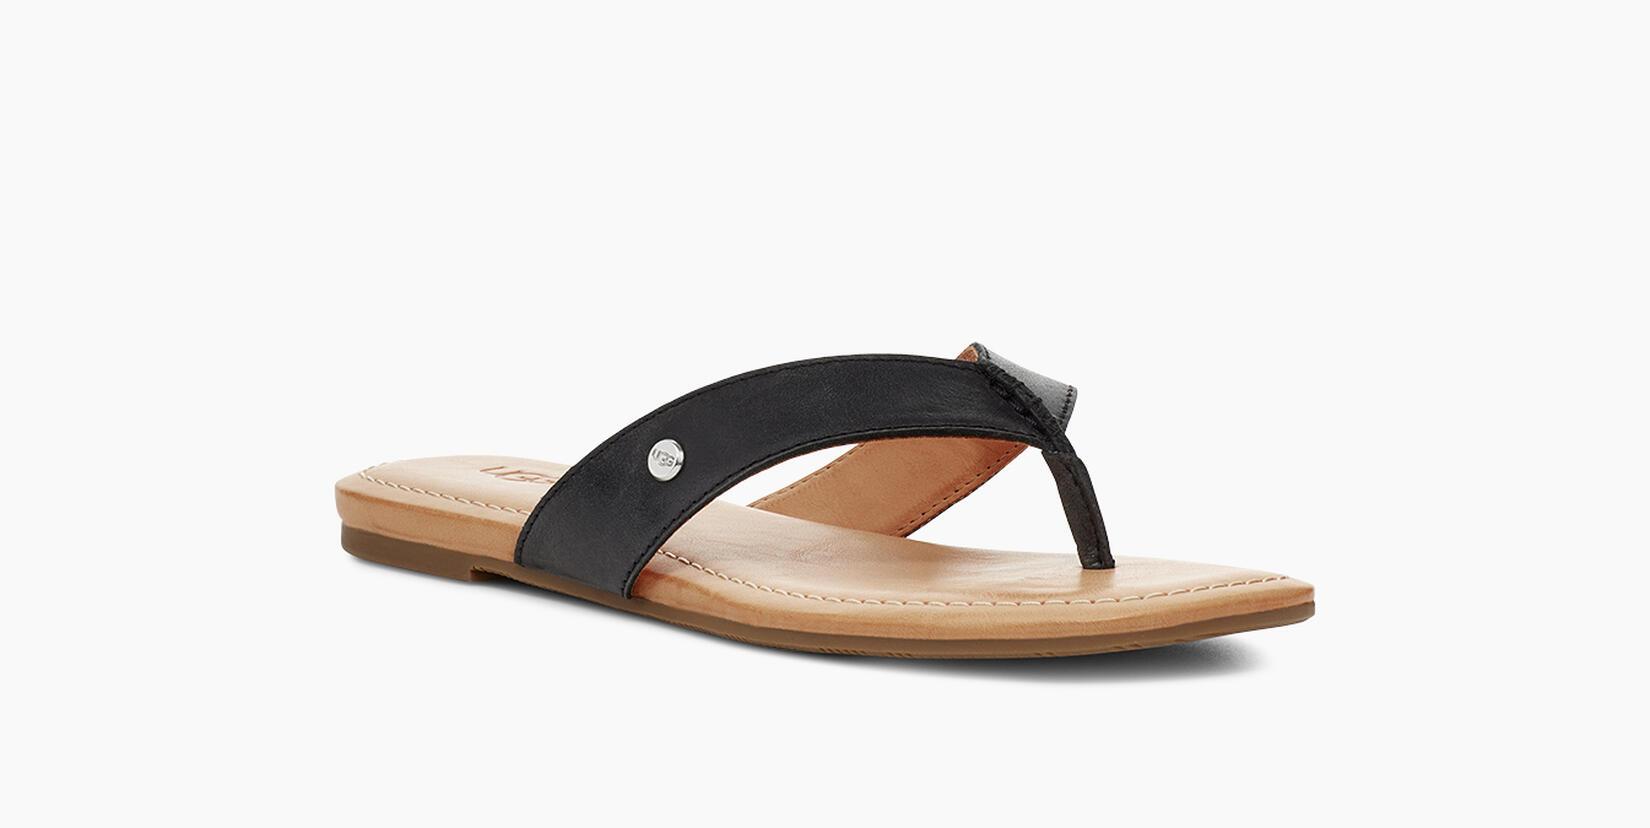 Tuolumne Leather Flip Flop